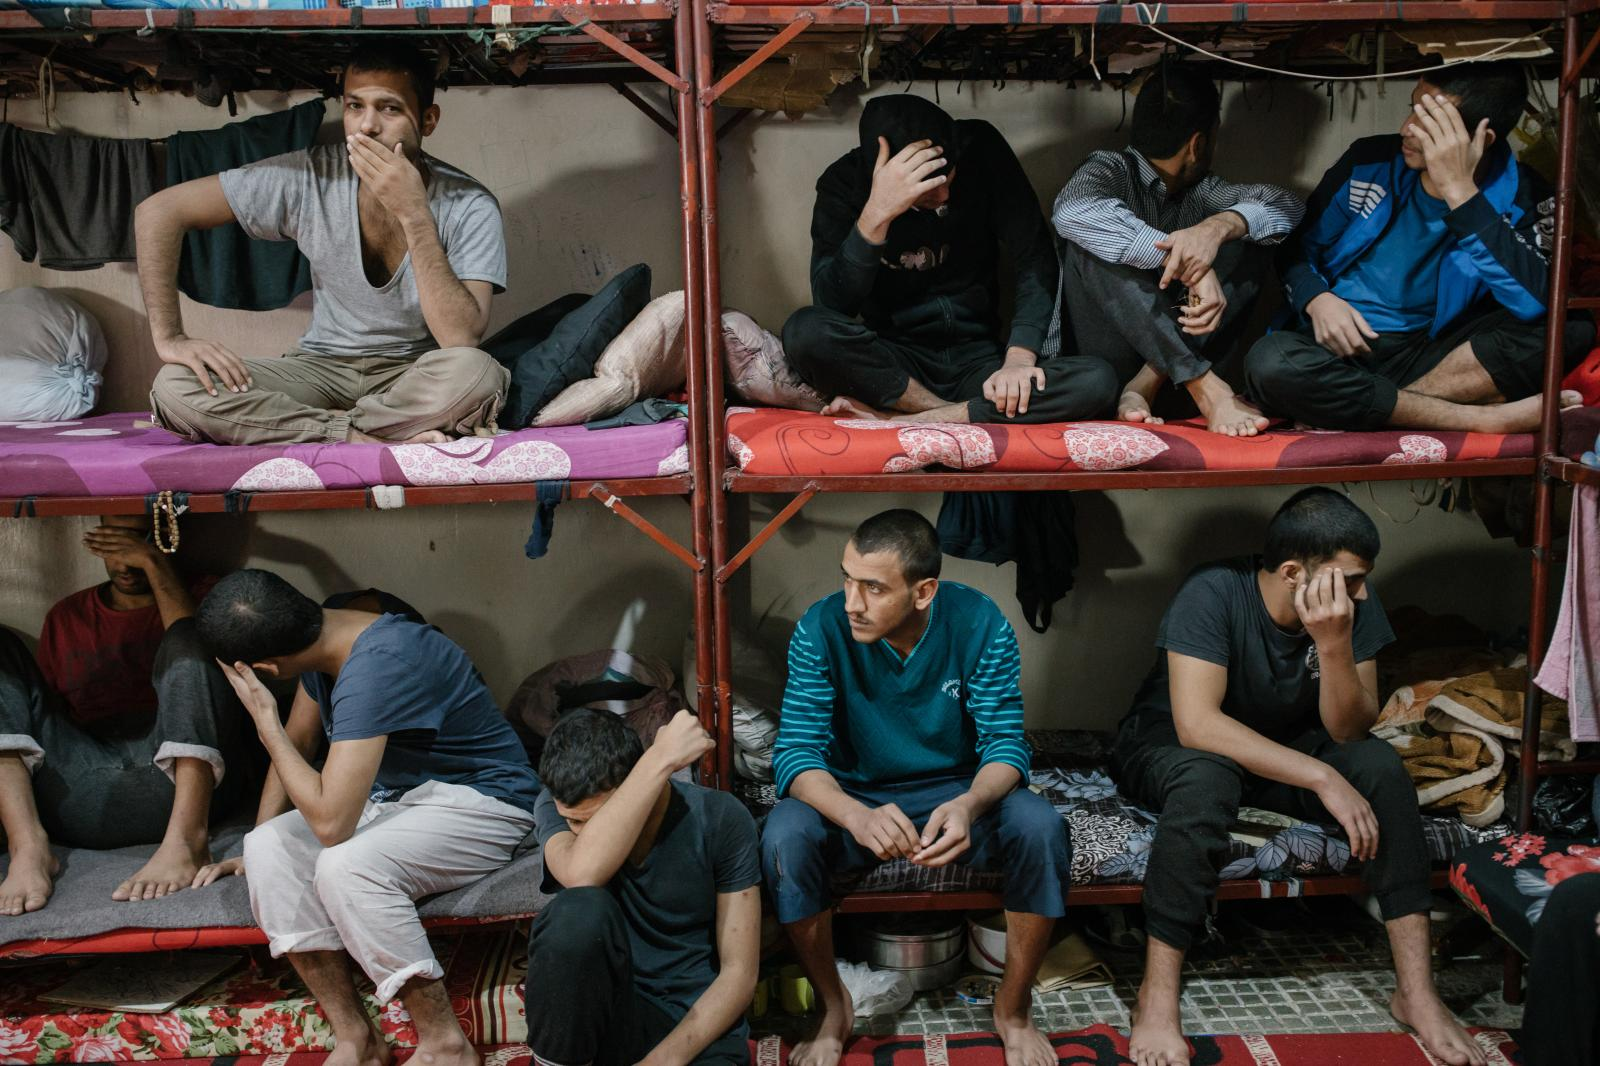 Photography image - Loading LGEAI_PRISON_KURDES-ISIS2.jpg